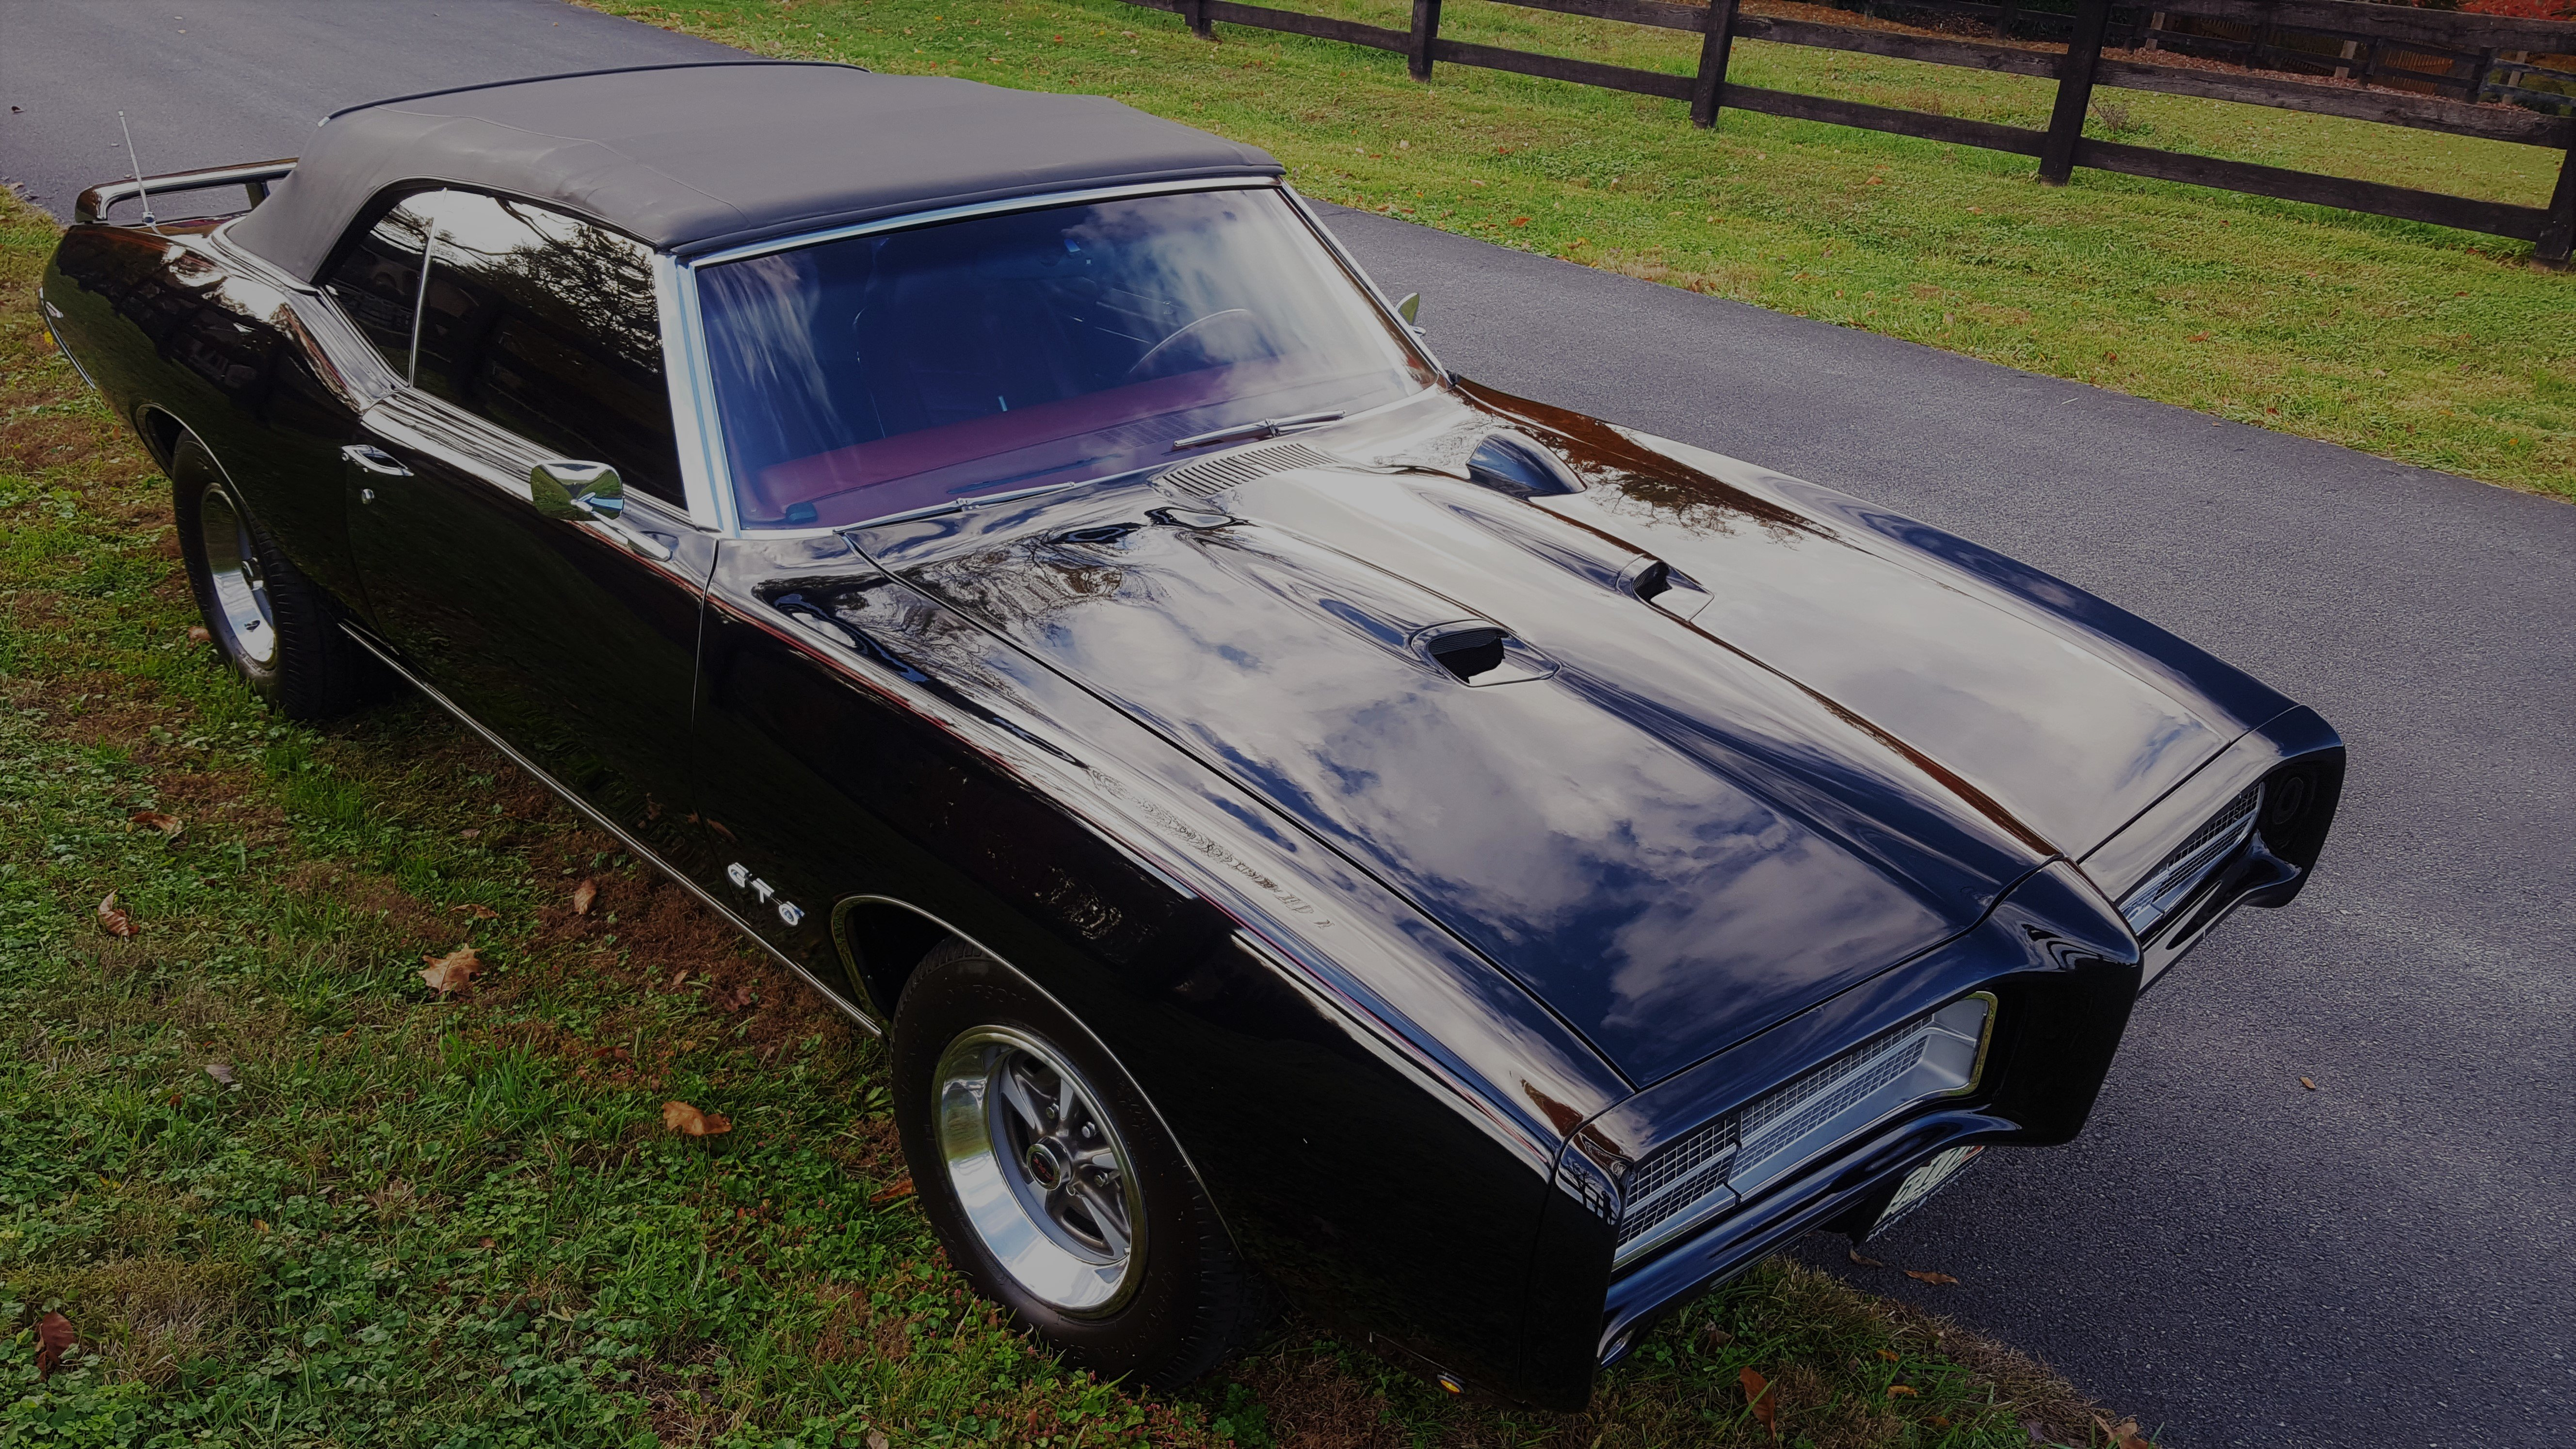 1969 Pontiac Gto Classics For Sale On Autotrader 1960s Judge